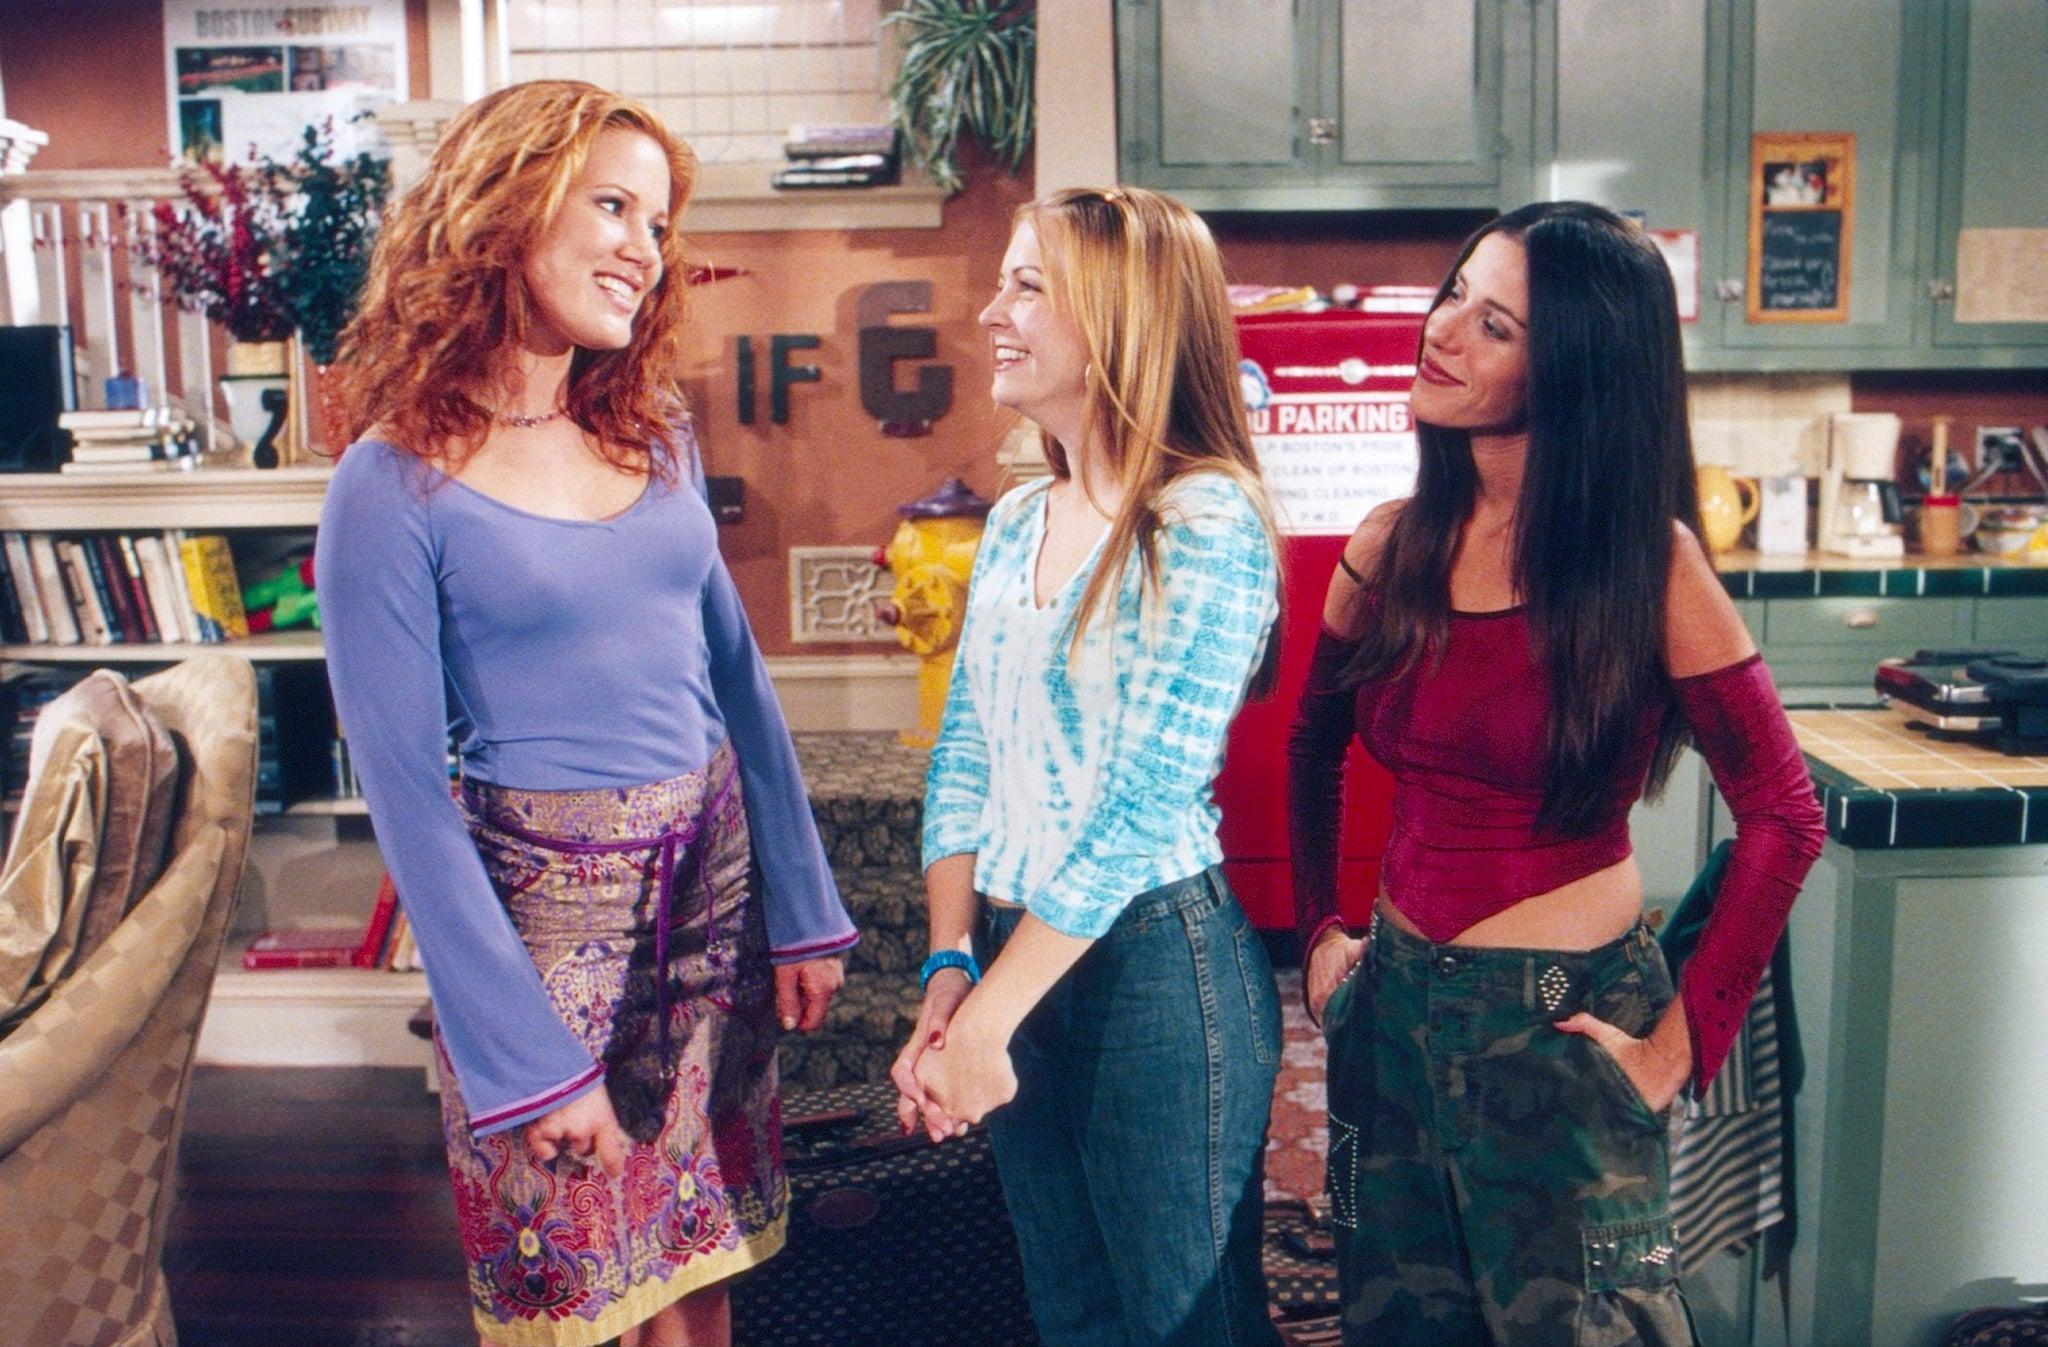 SABRINA THE TEENAGE WITCH, from left: Elisa Donovan, Melissa Joan Hart, Soleil Moon Frye, (Season 5, 2000), 1996-2003. photo: Randy Tepper / Viacom / Courtesy: Everett Collection